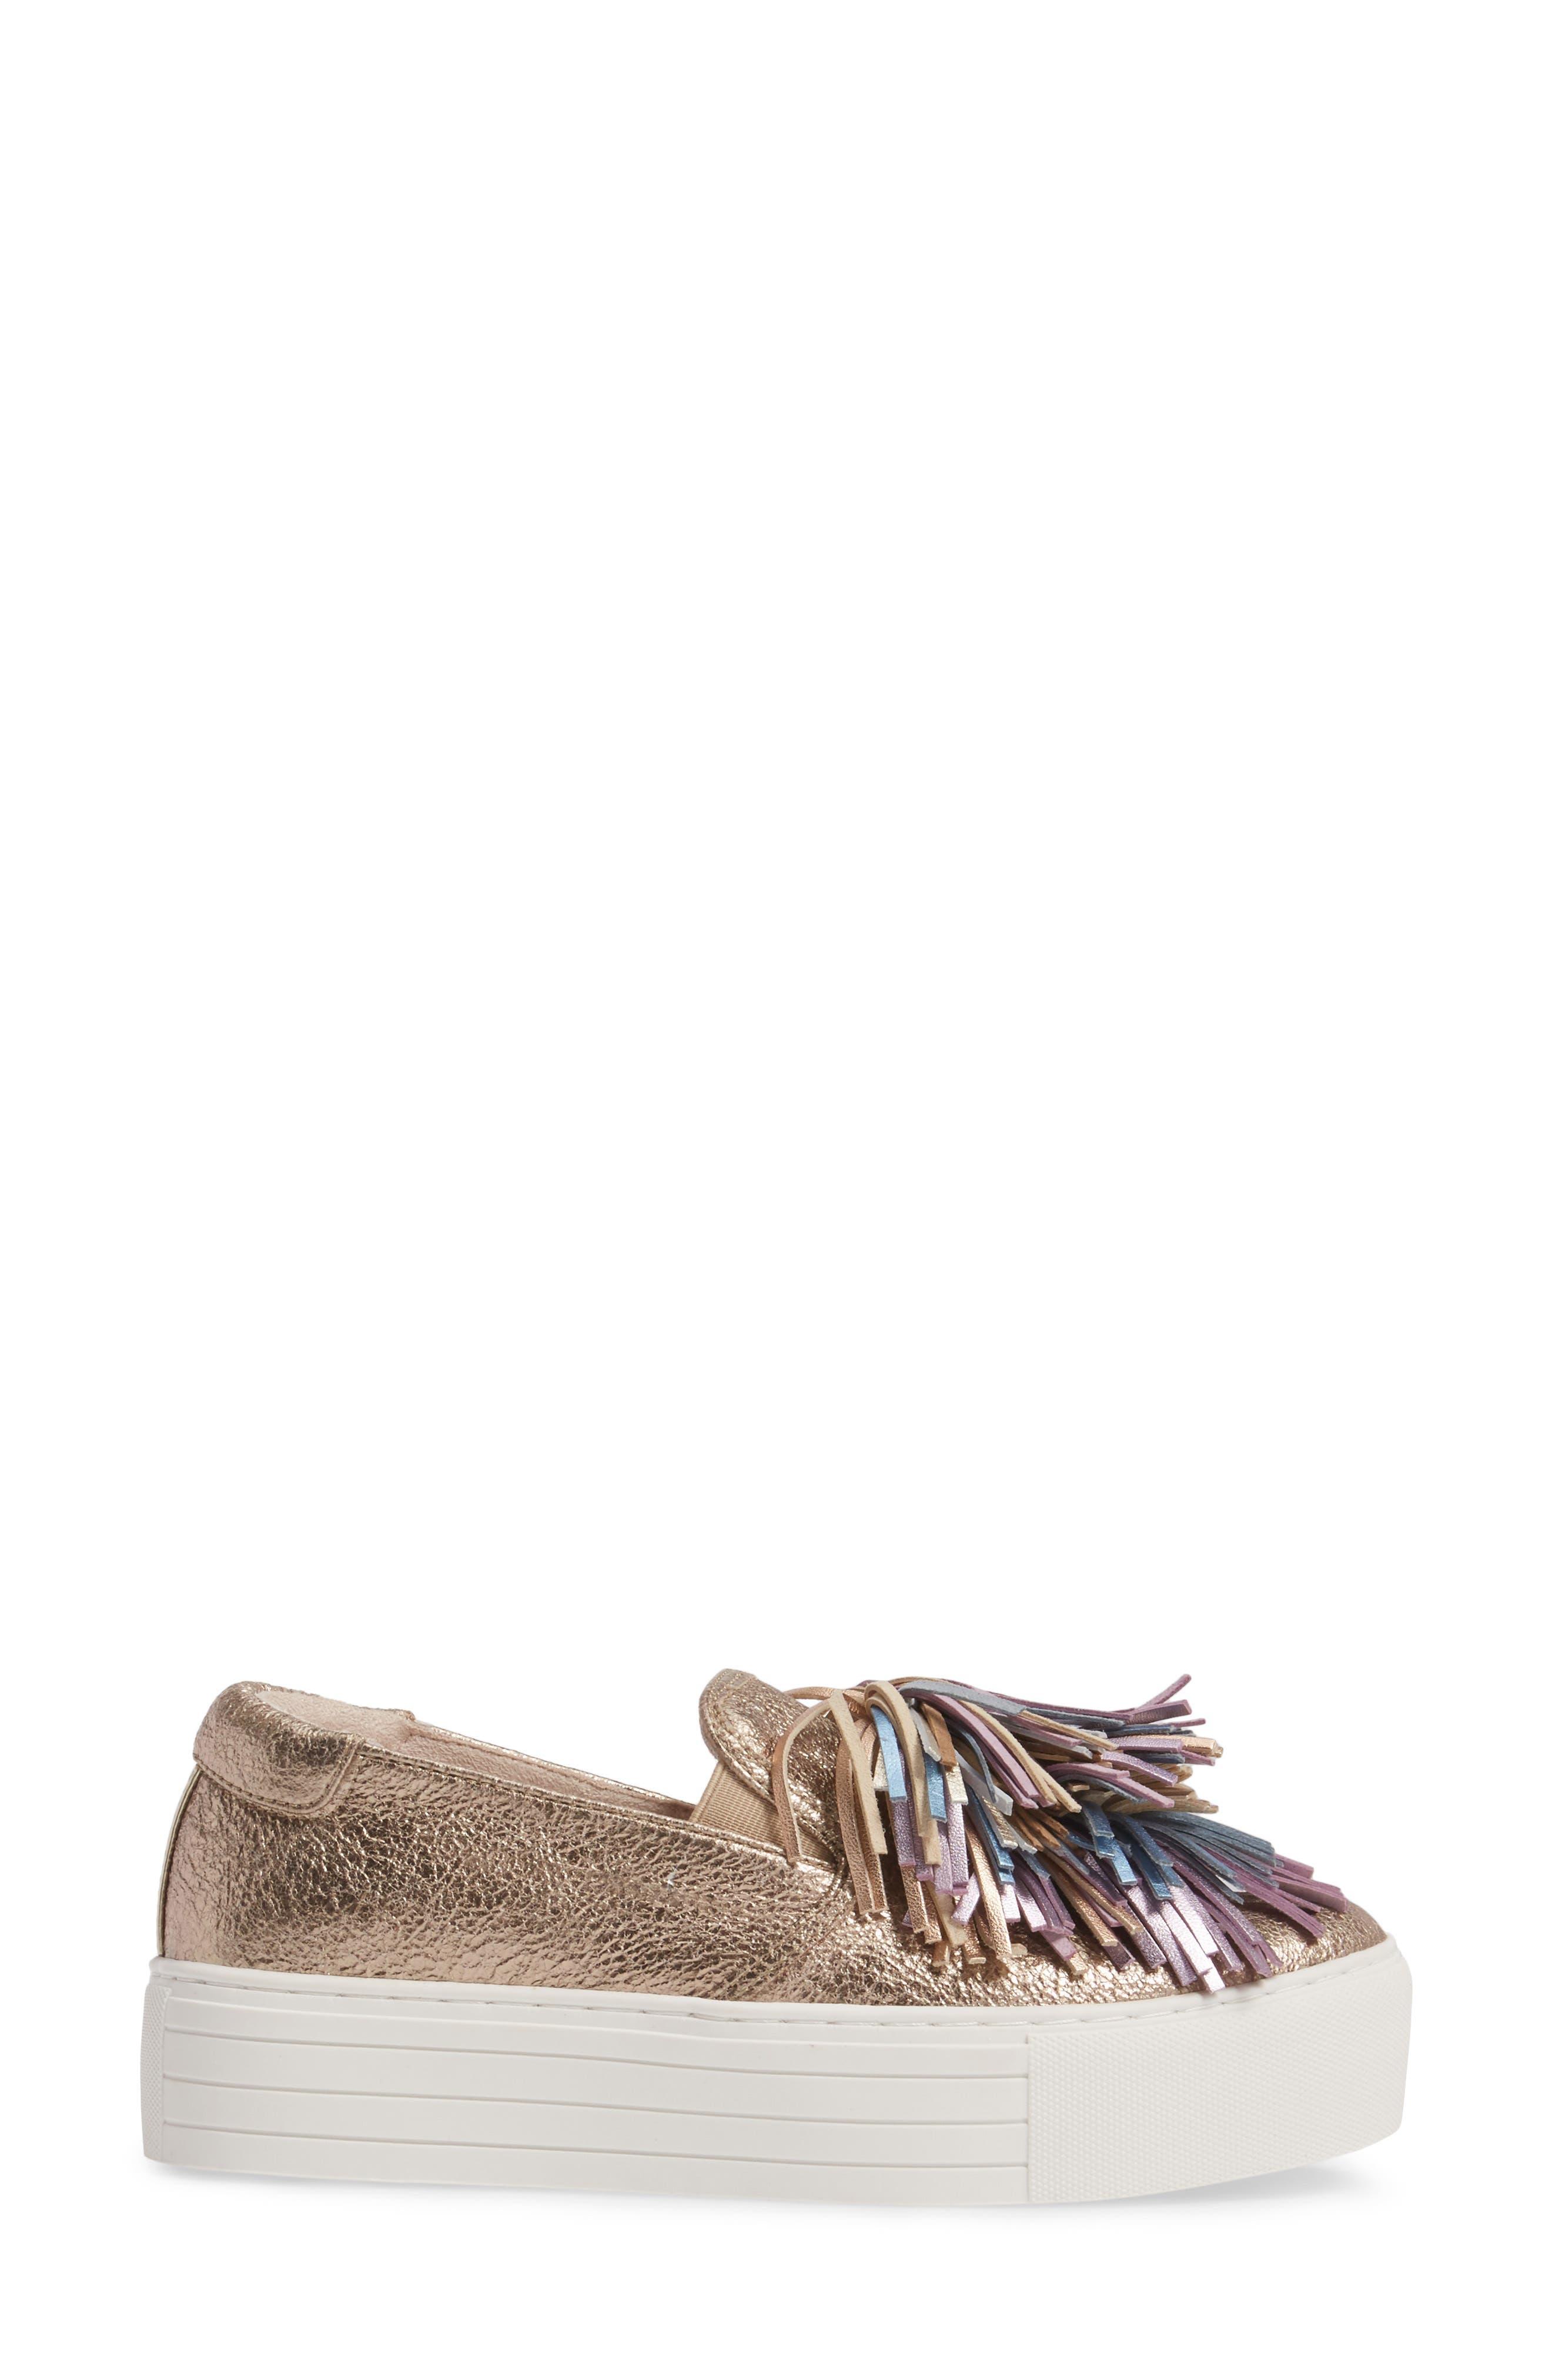 Alternate Image 3  - Kenneth Cole New York Jayson Pom Platform Sneaker (Women)